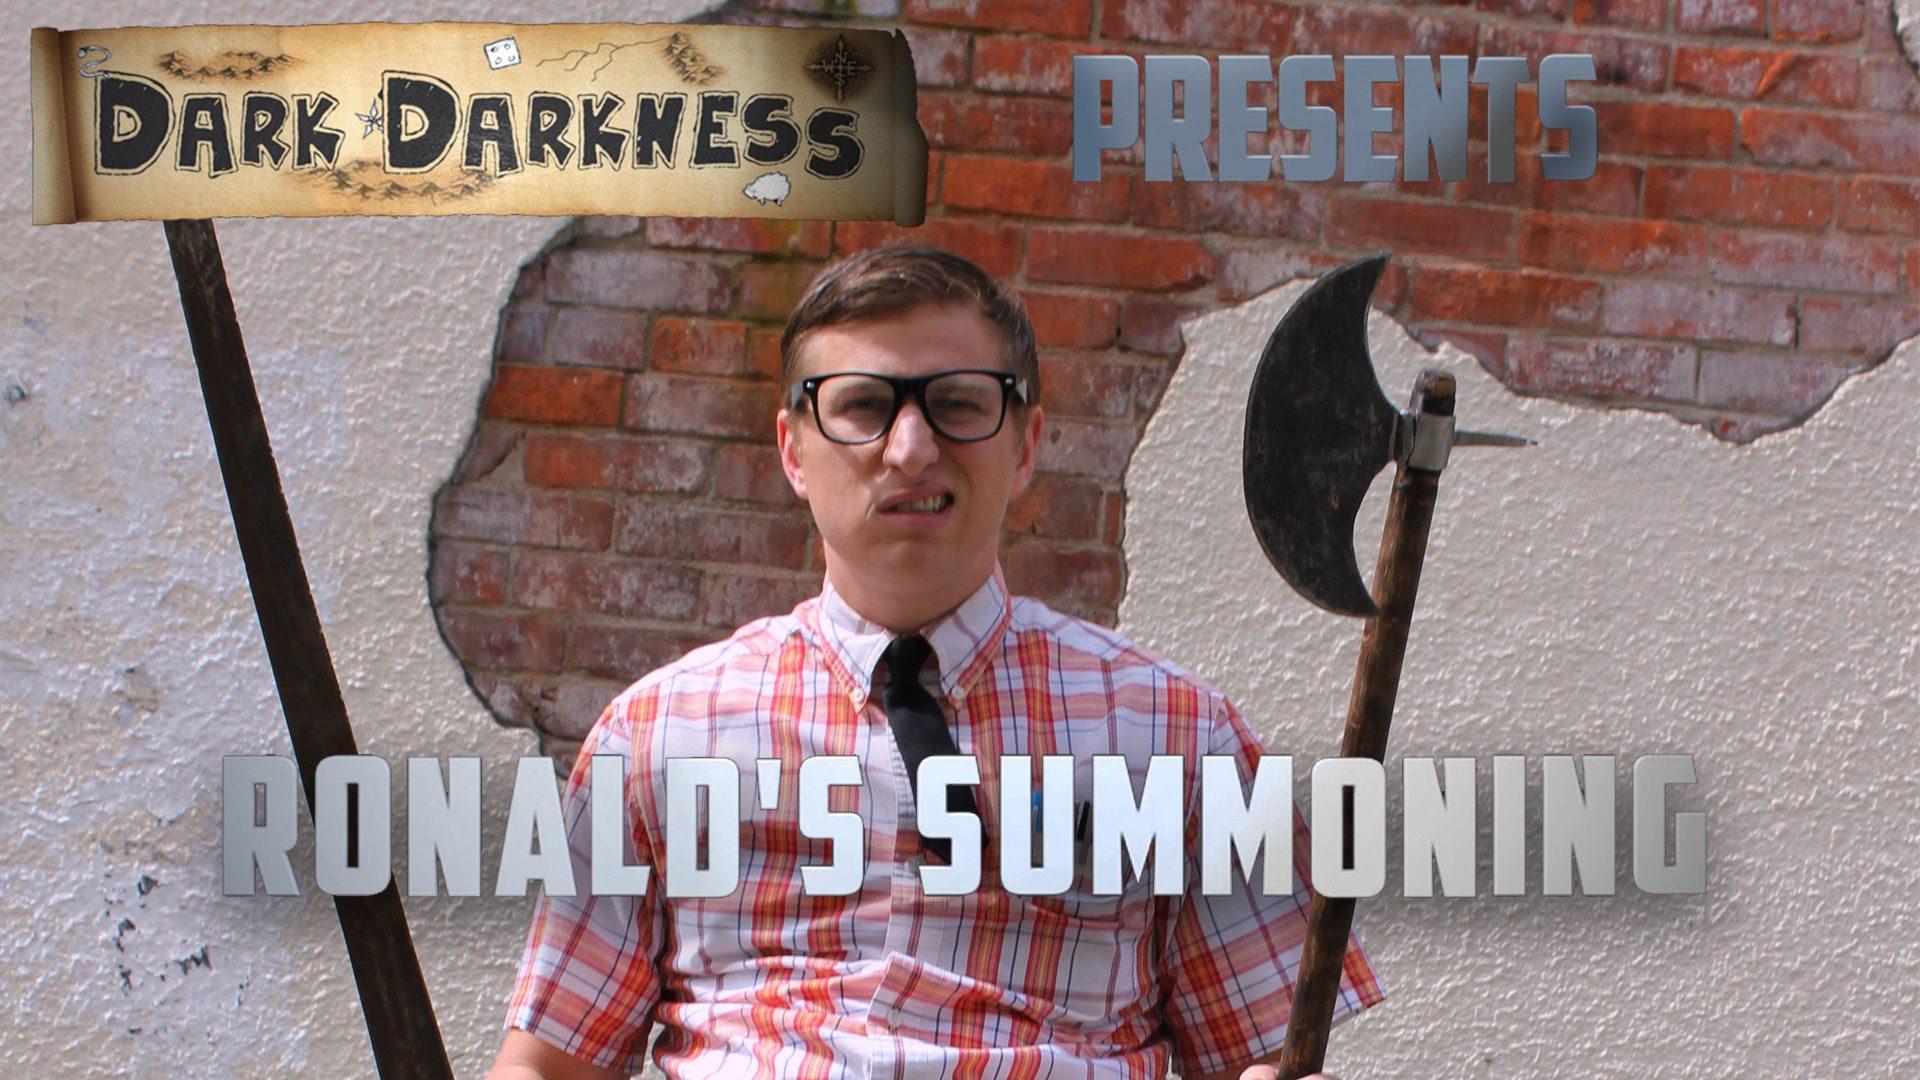 Dark Darkness Episode 01 Ronald's Summoning